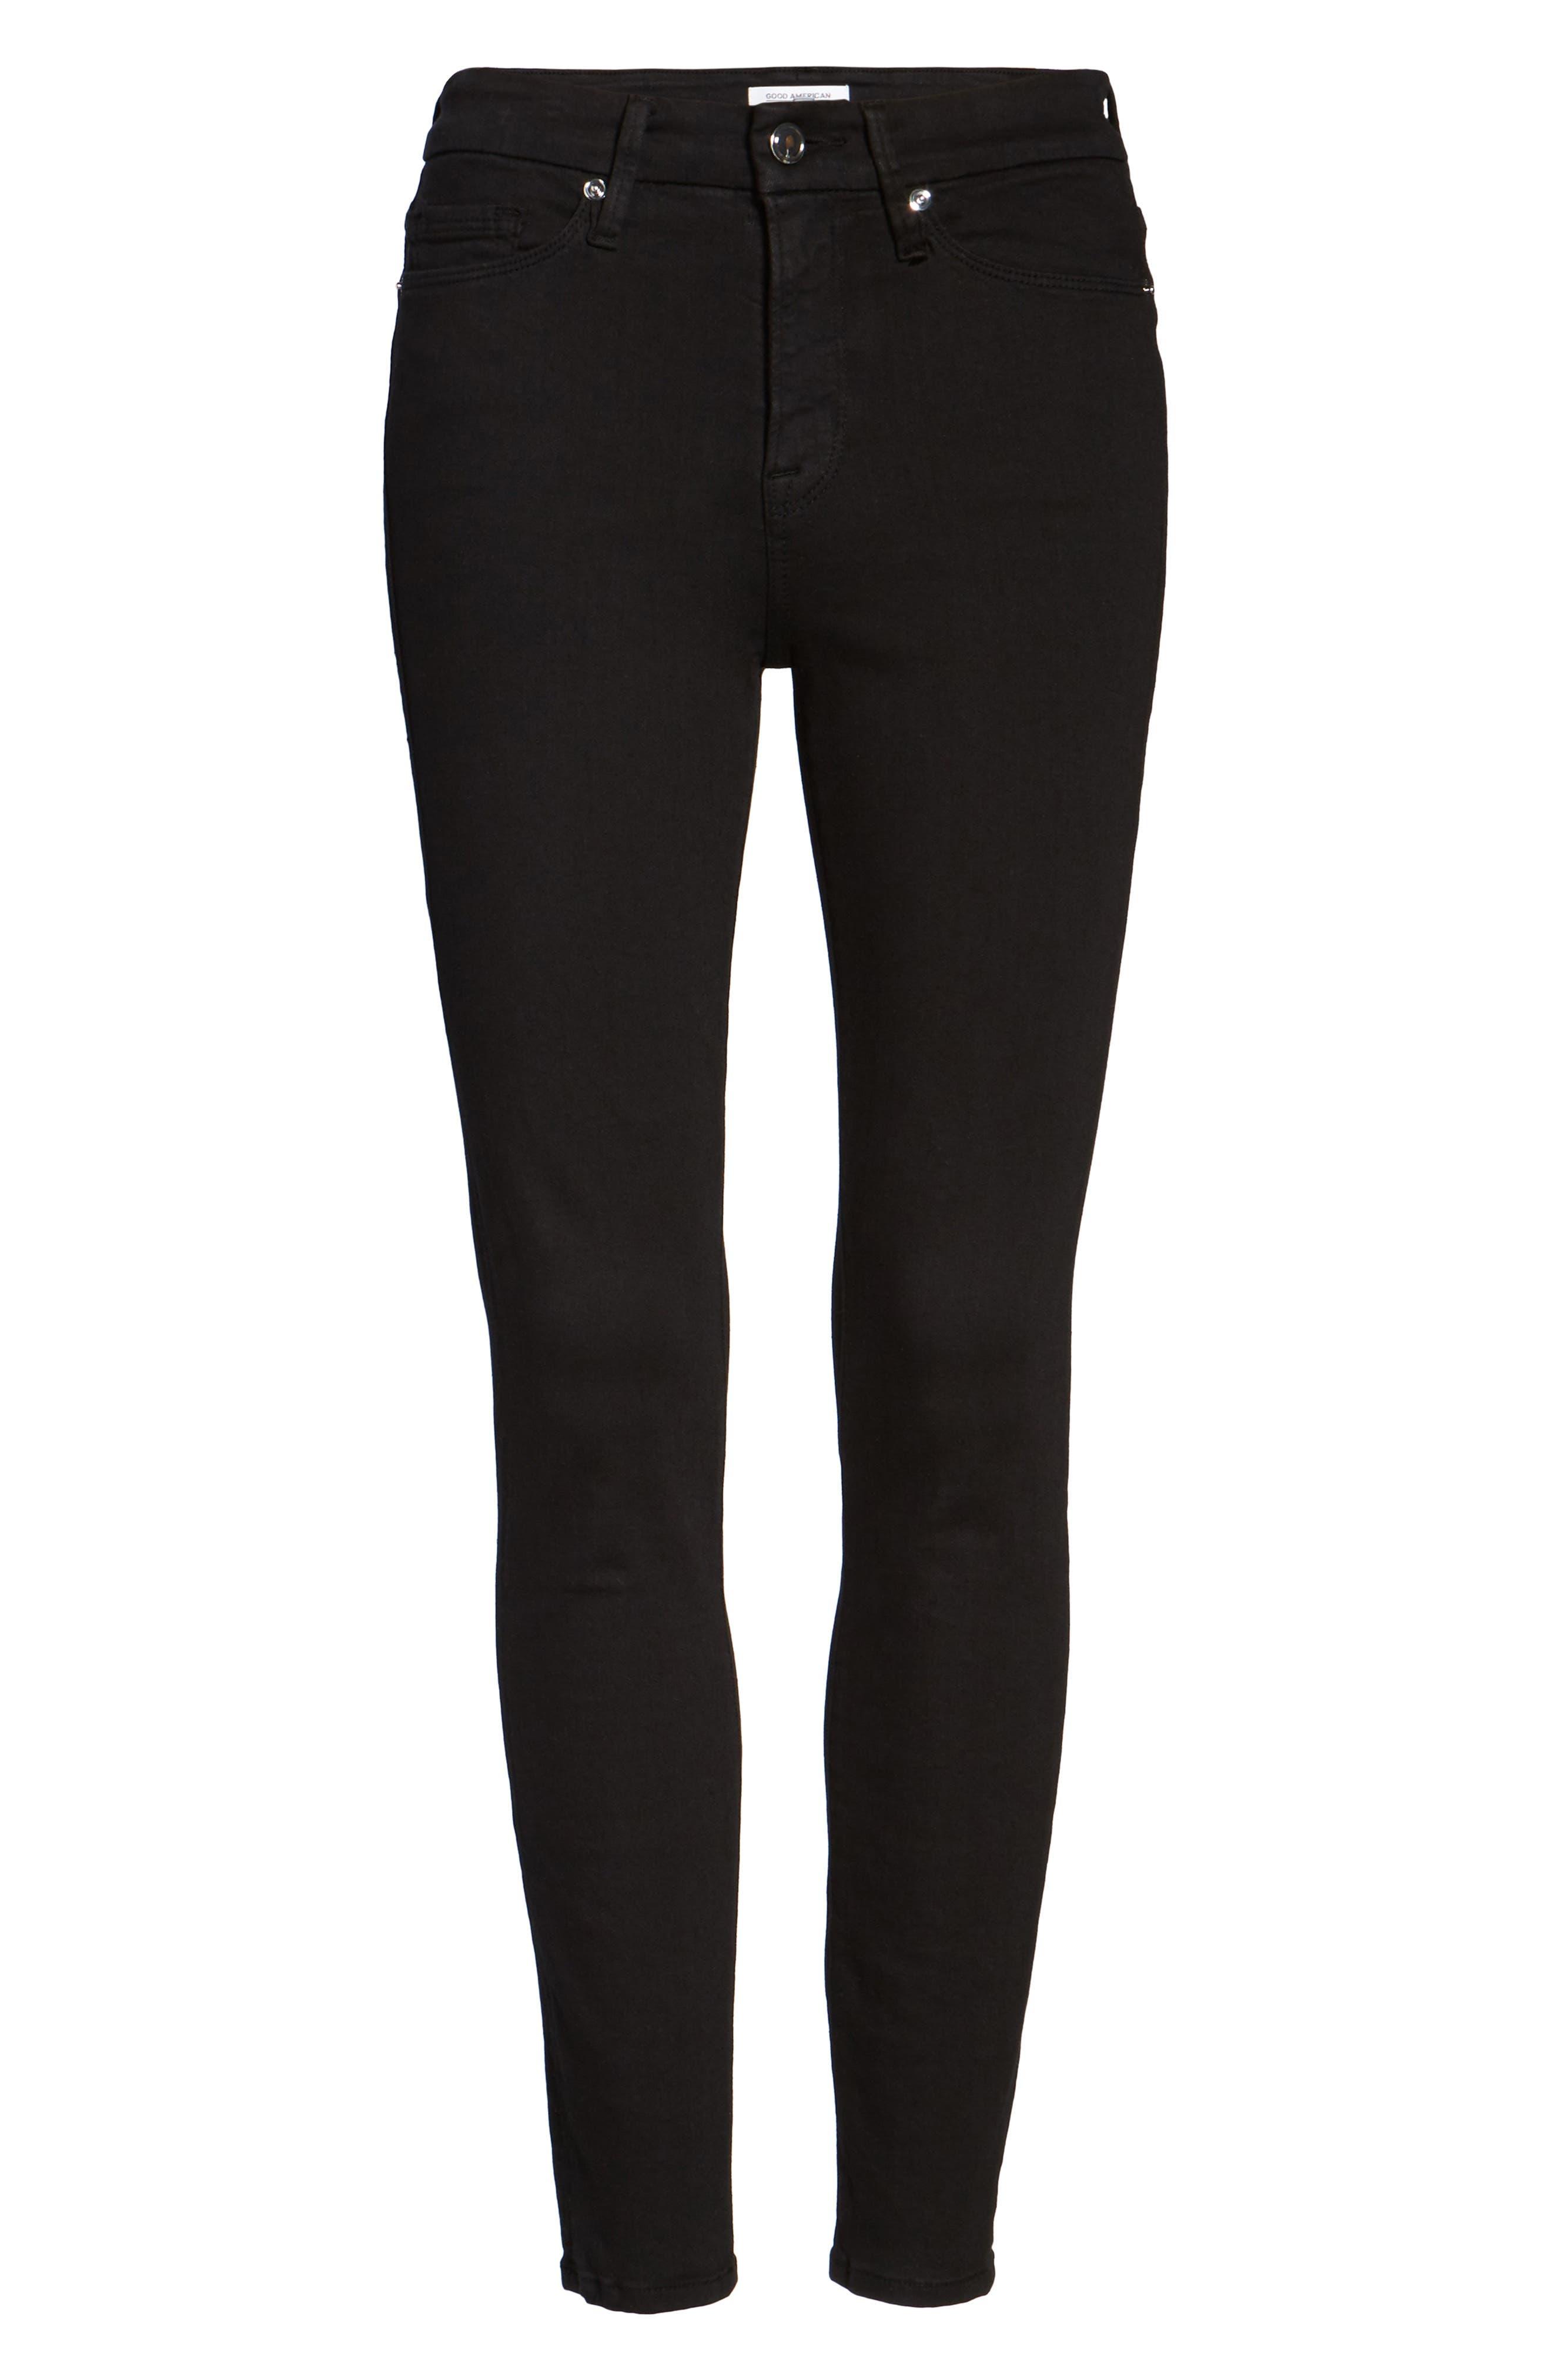 GOOD AMERICAN, Good Legs High Rise Crop Skinny Jeans, Alternate thumbnail 7, color, BLACK 001